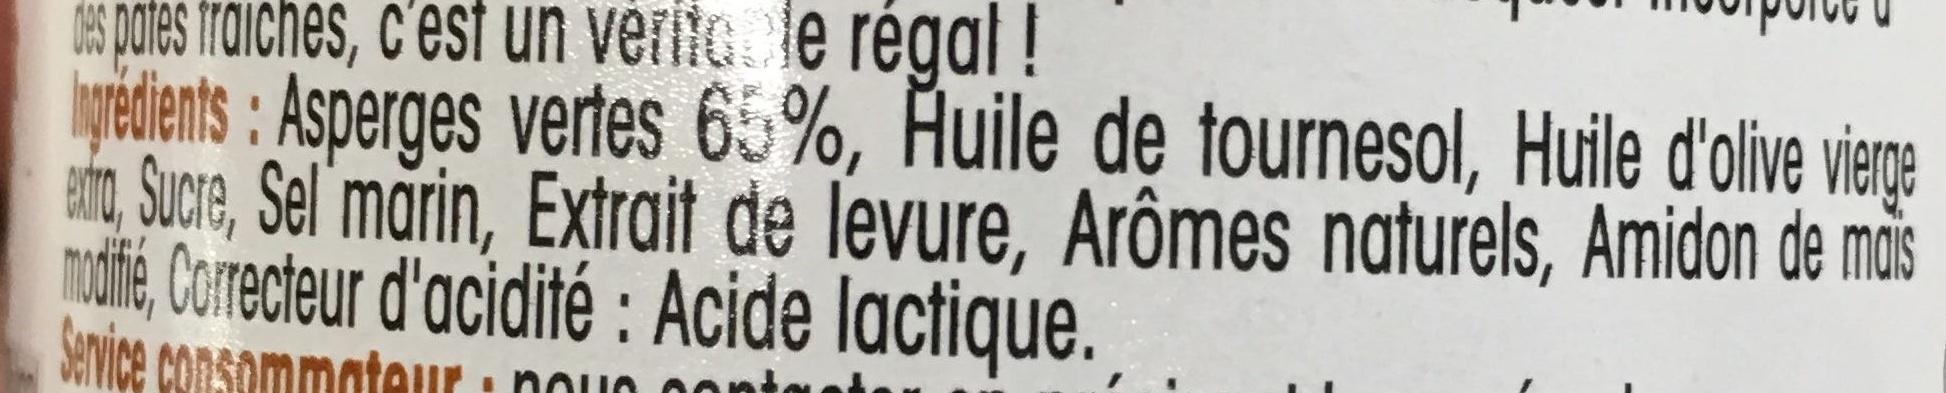 Asperges Vertes en Sauce et Morceaux - Ingredients - fr